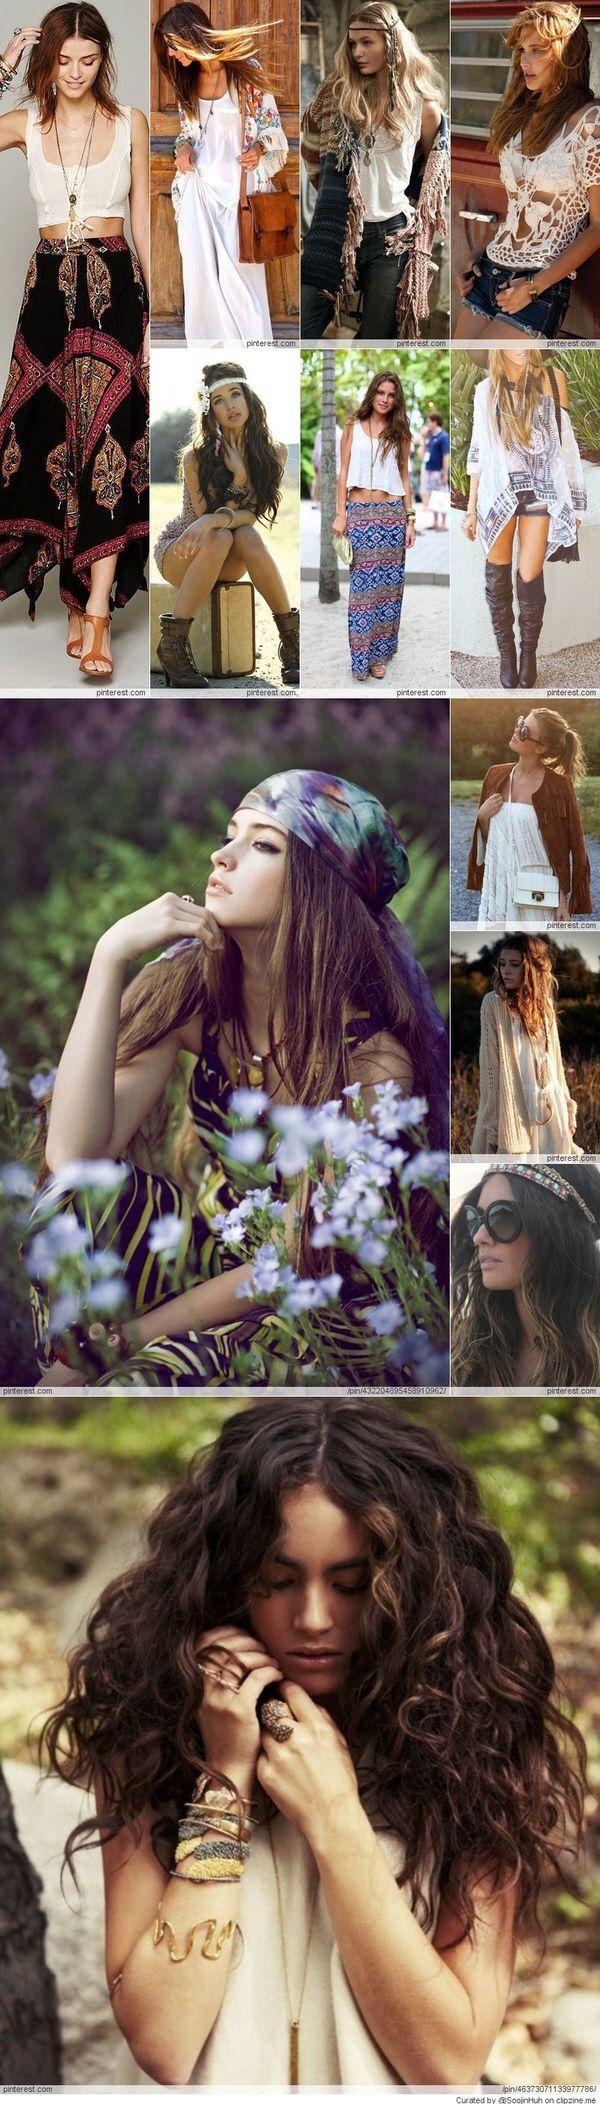 Wonderful #BridalDress Collection By Hadas Cohen 2015 #Fashion